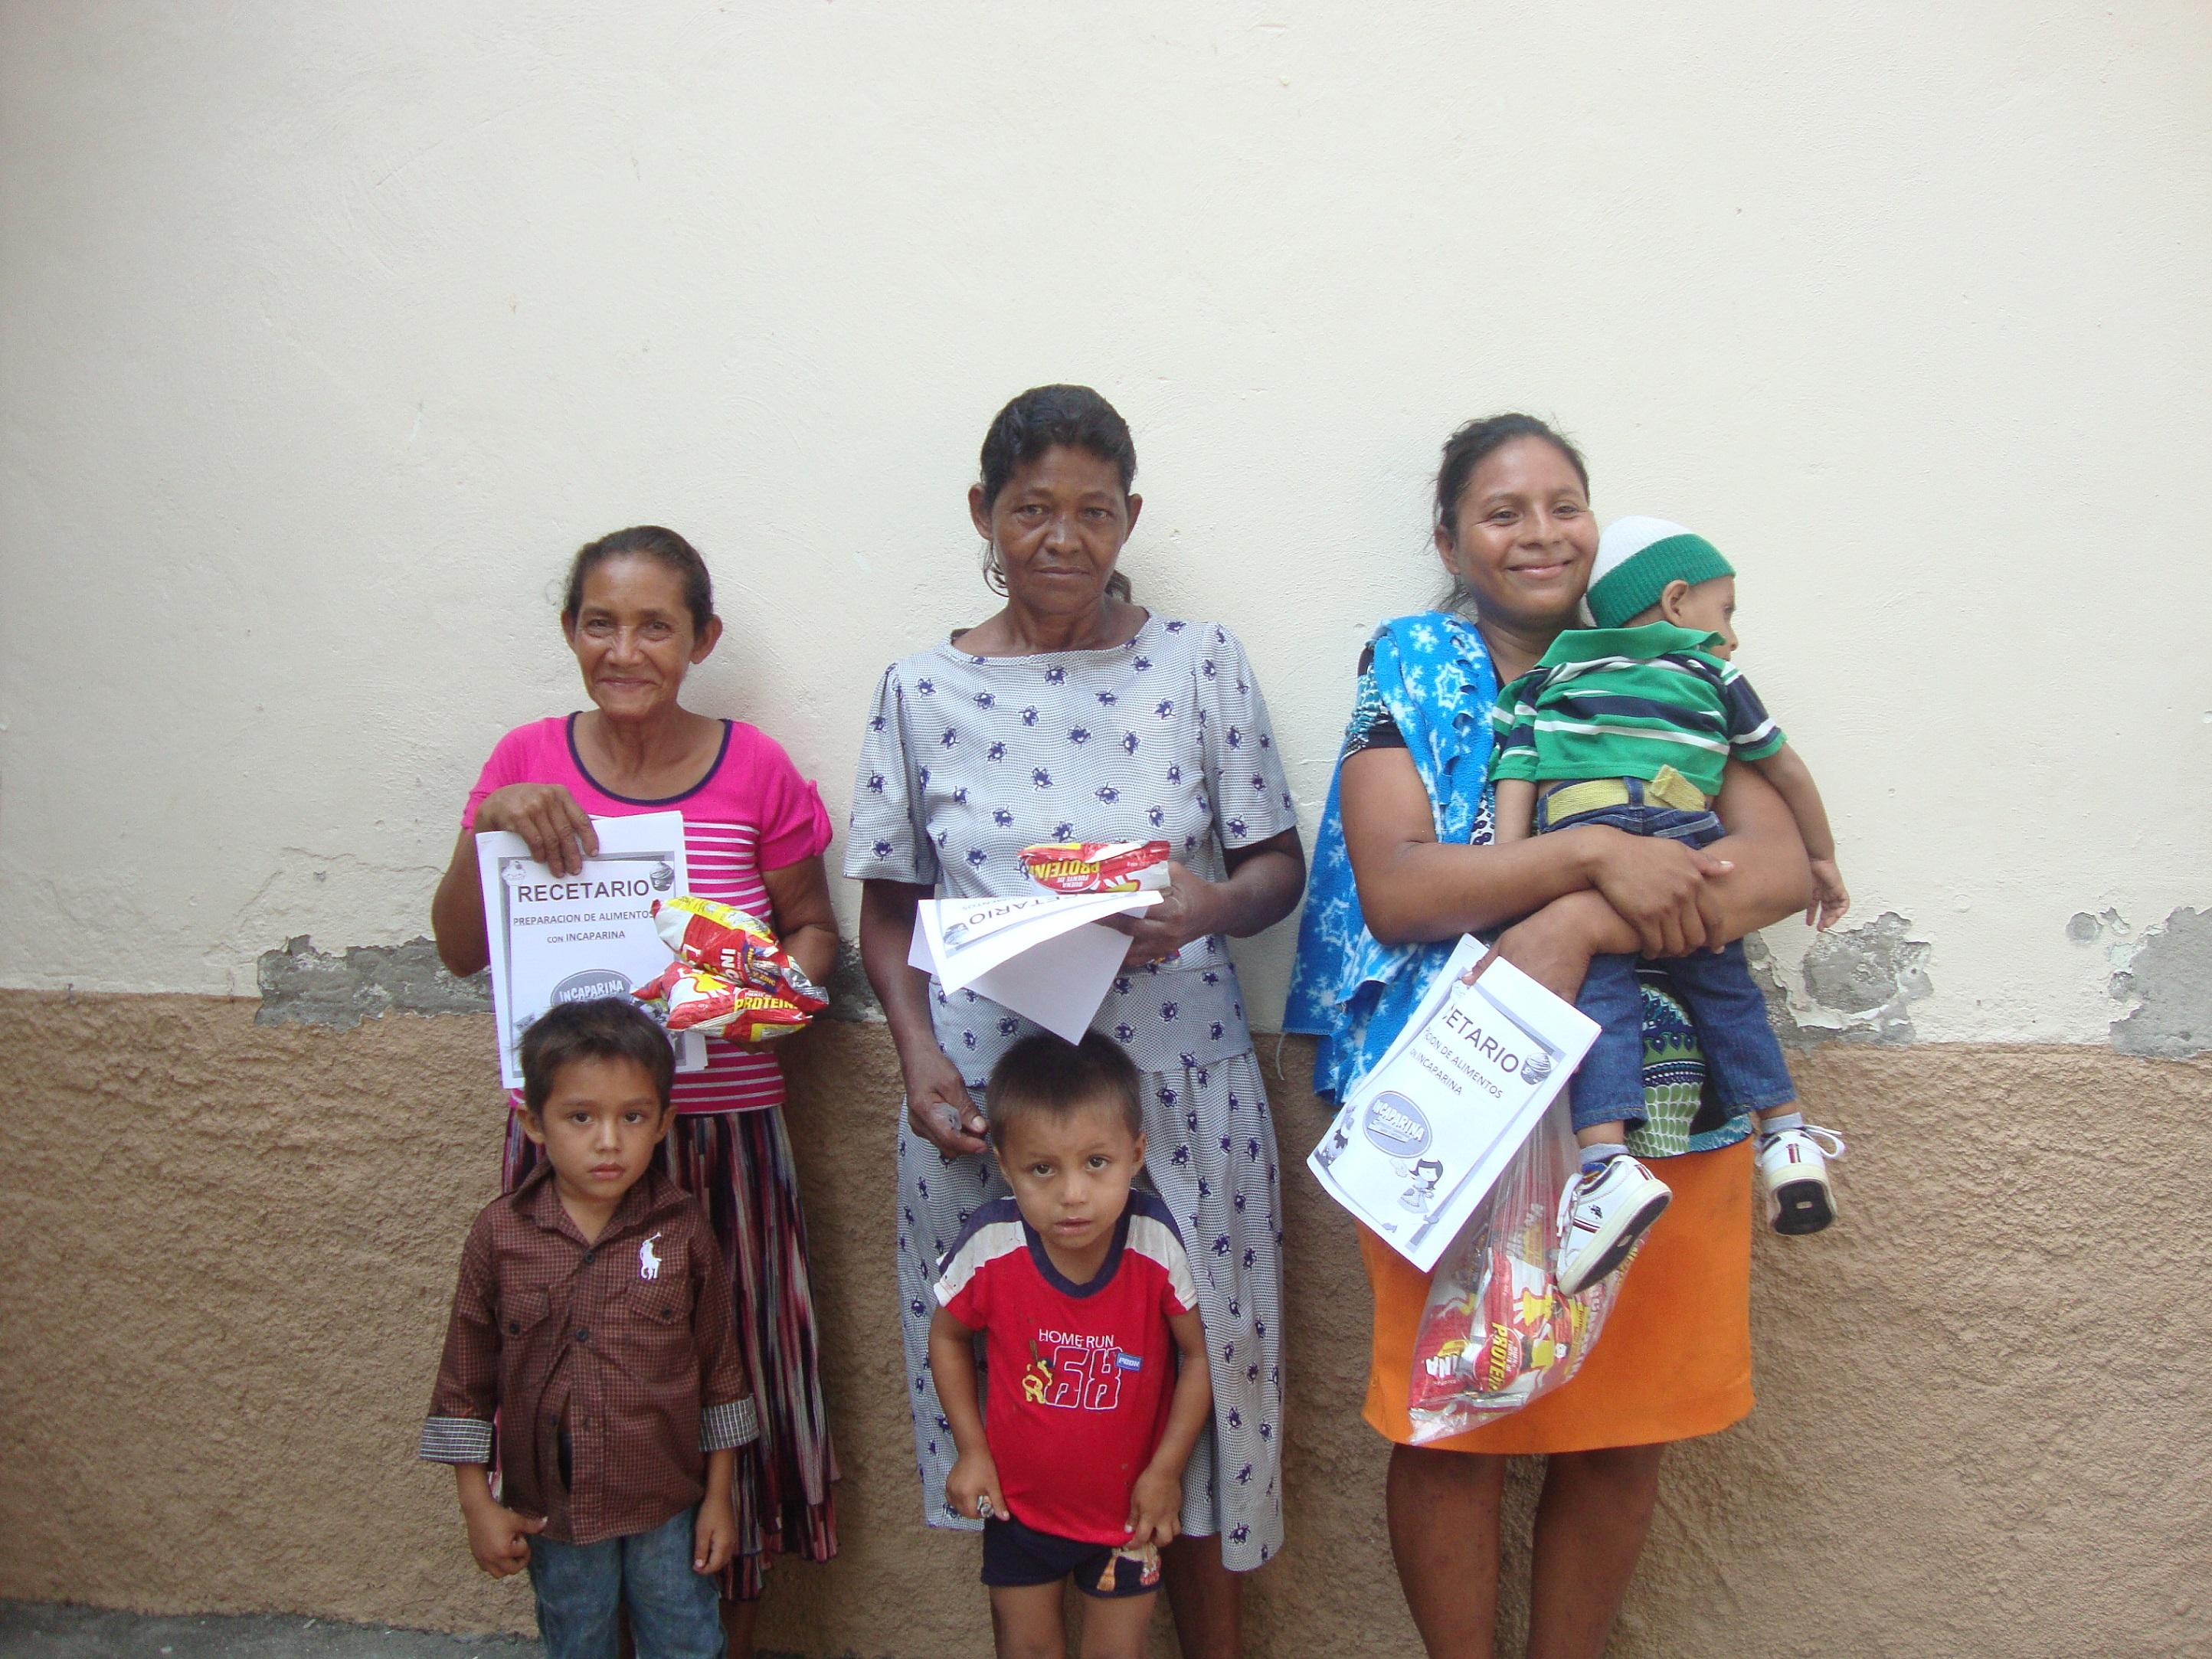 Monjaras-2-2015-10